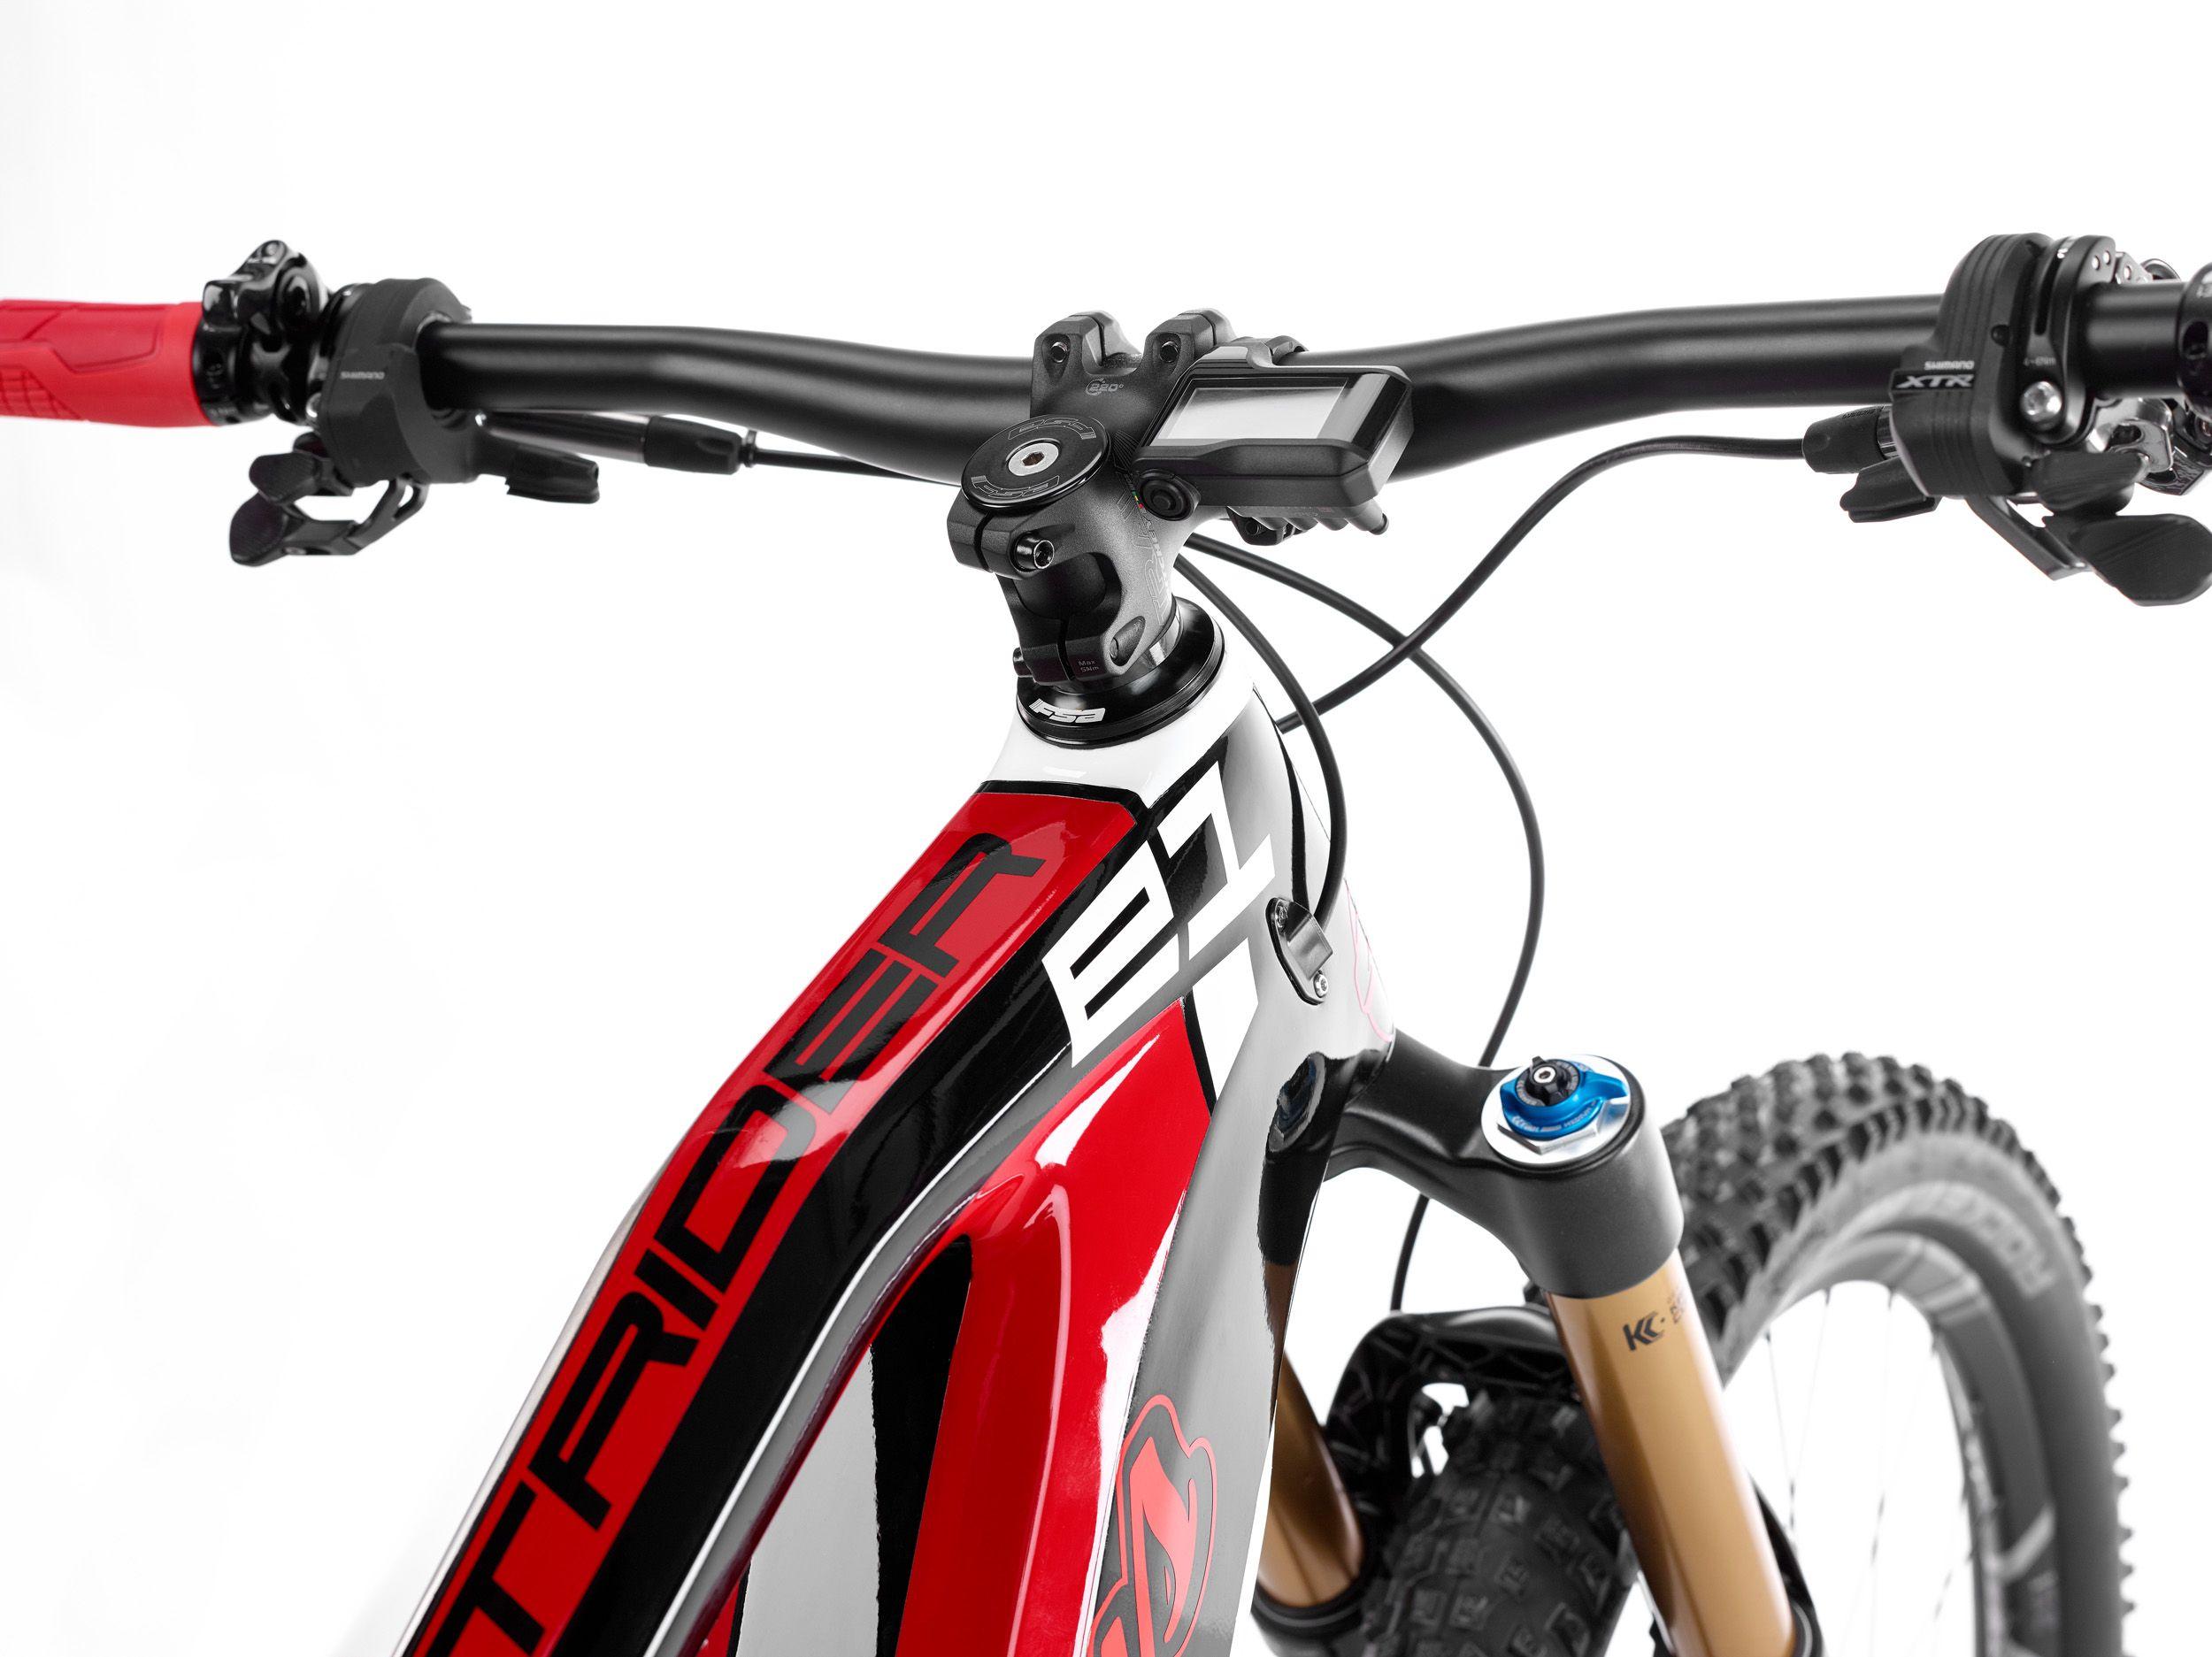 th mus lightrider e1 das schweizer elektro mountainbike. Black Bedroom Furniture Sets. Home Design Ideas